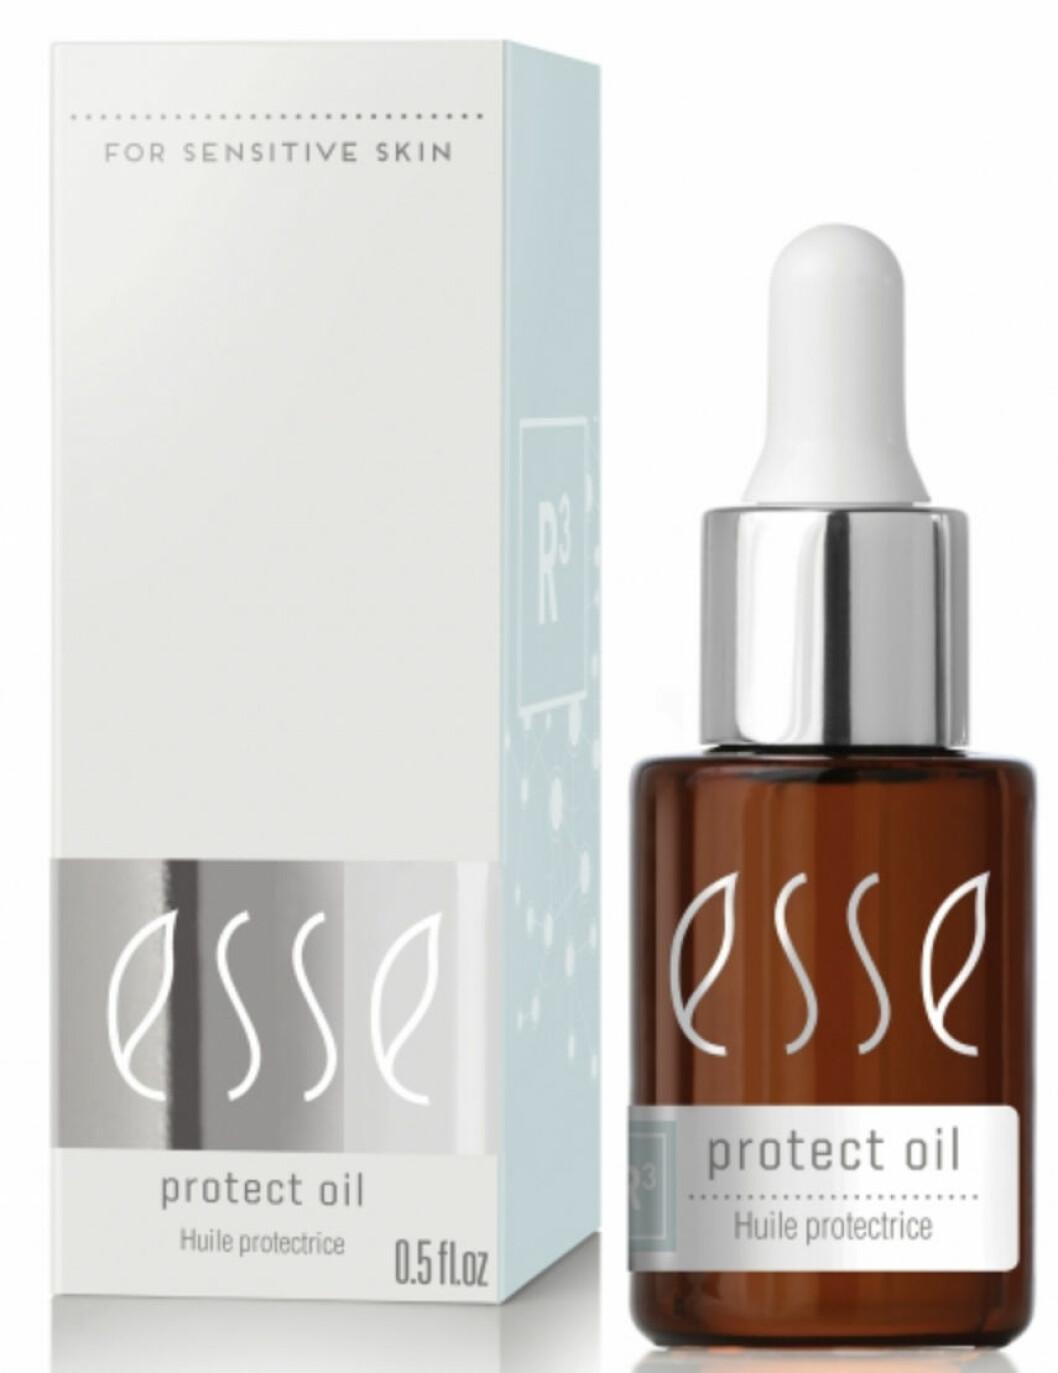 ESSE Protect Oil